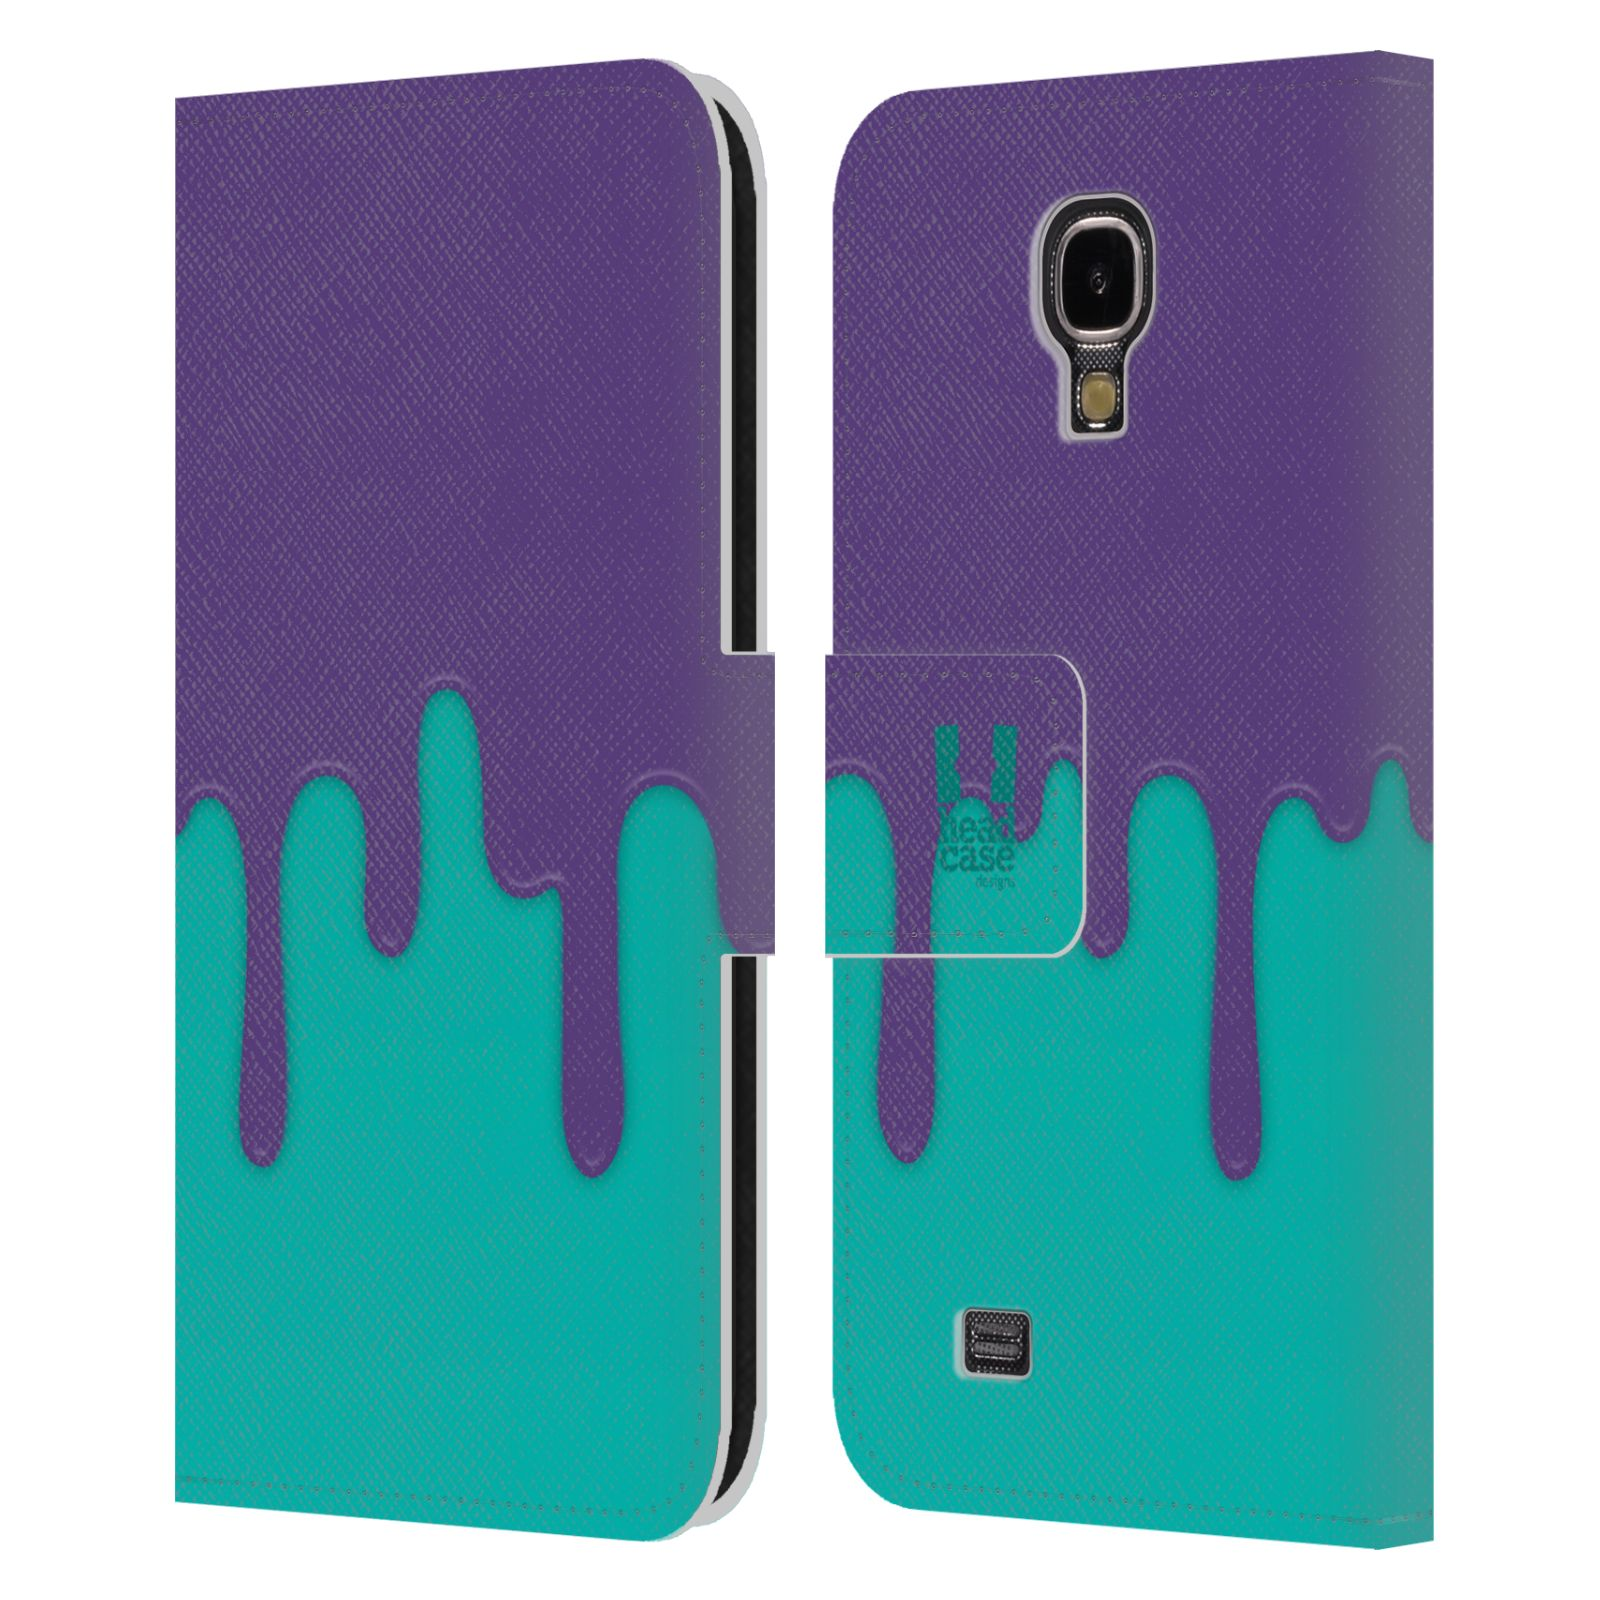 HEAD CASE Flipové pouzdro pro mobil Samsung Galaxy S4 Rozlitá barva fialová a tyrkysová